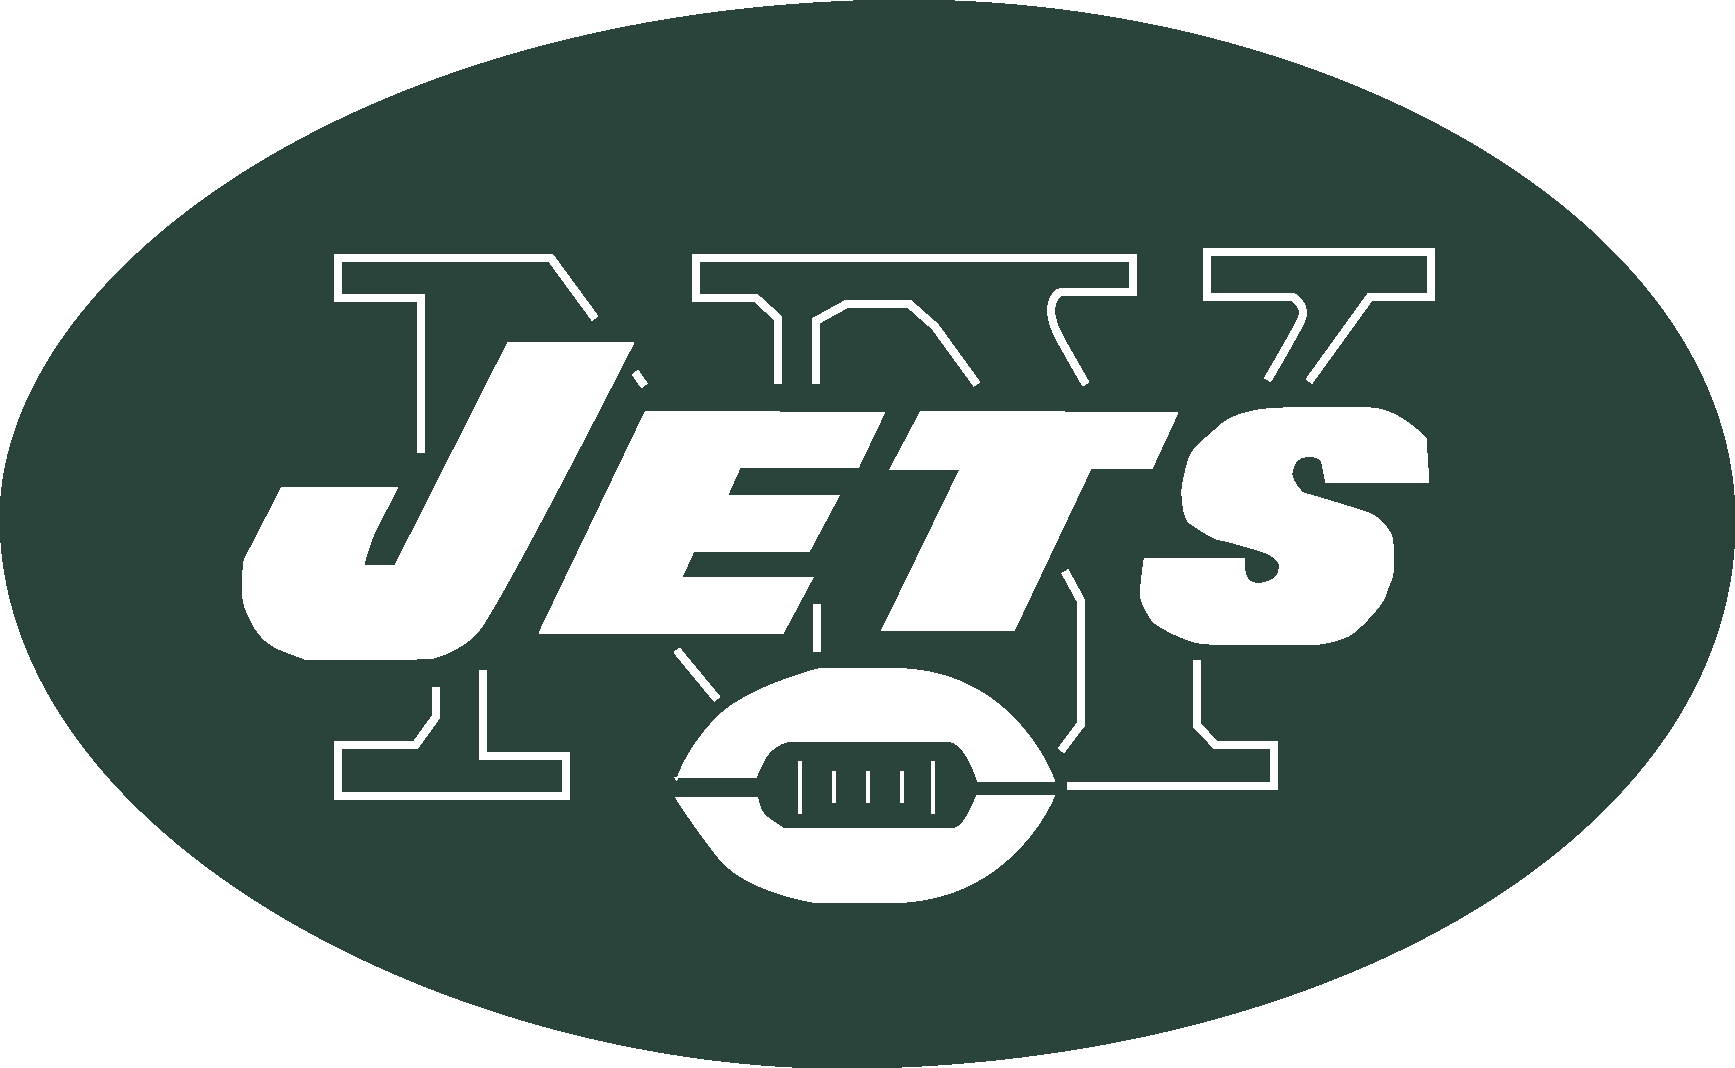 New York Jets Logo Download Vector.